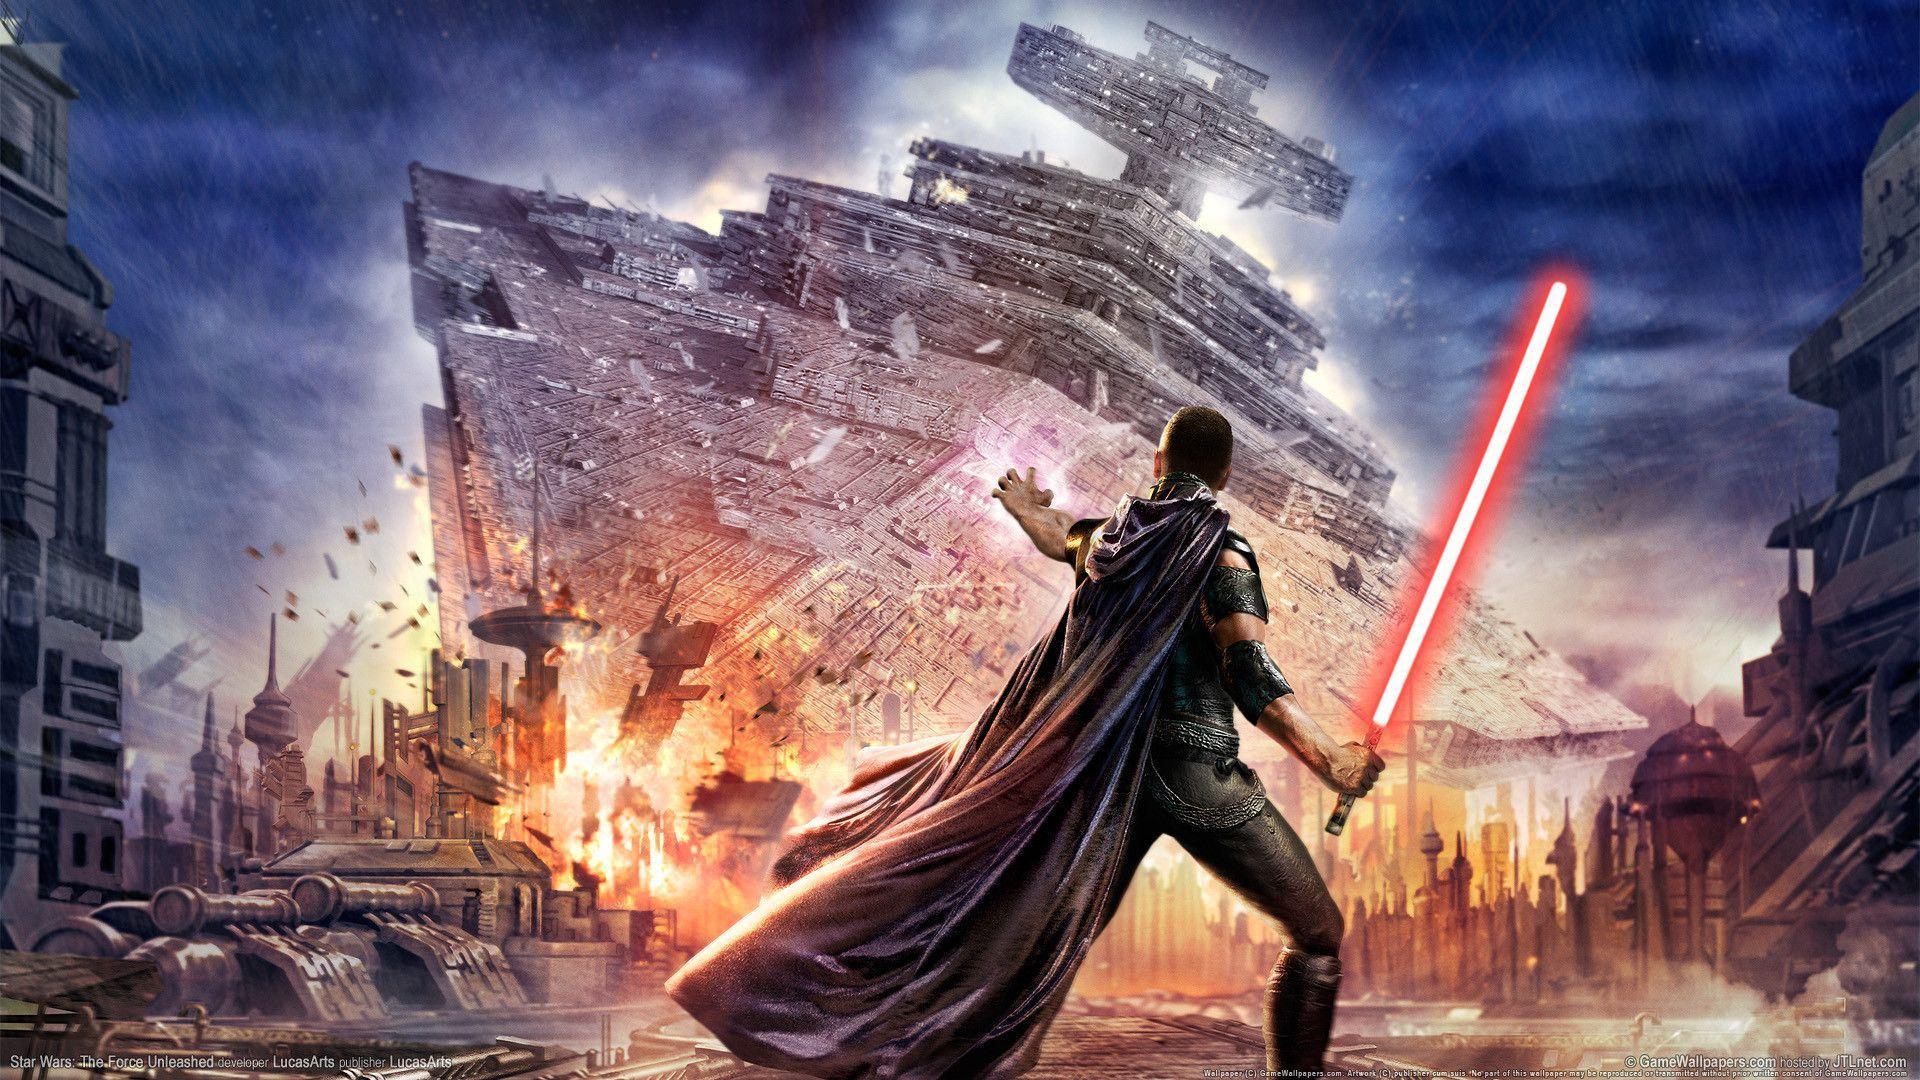 epic star wars trooper wallpaper - photo #39